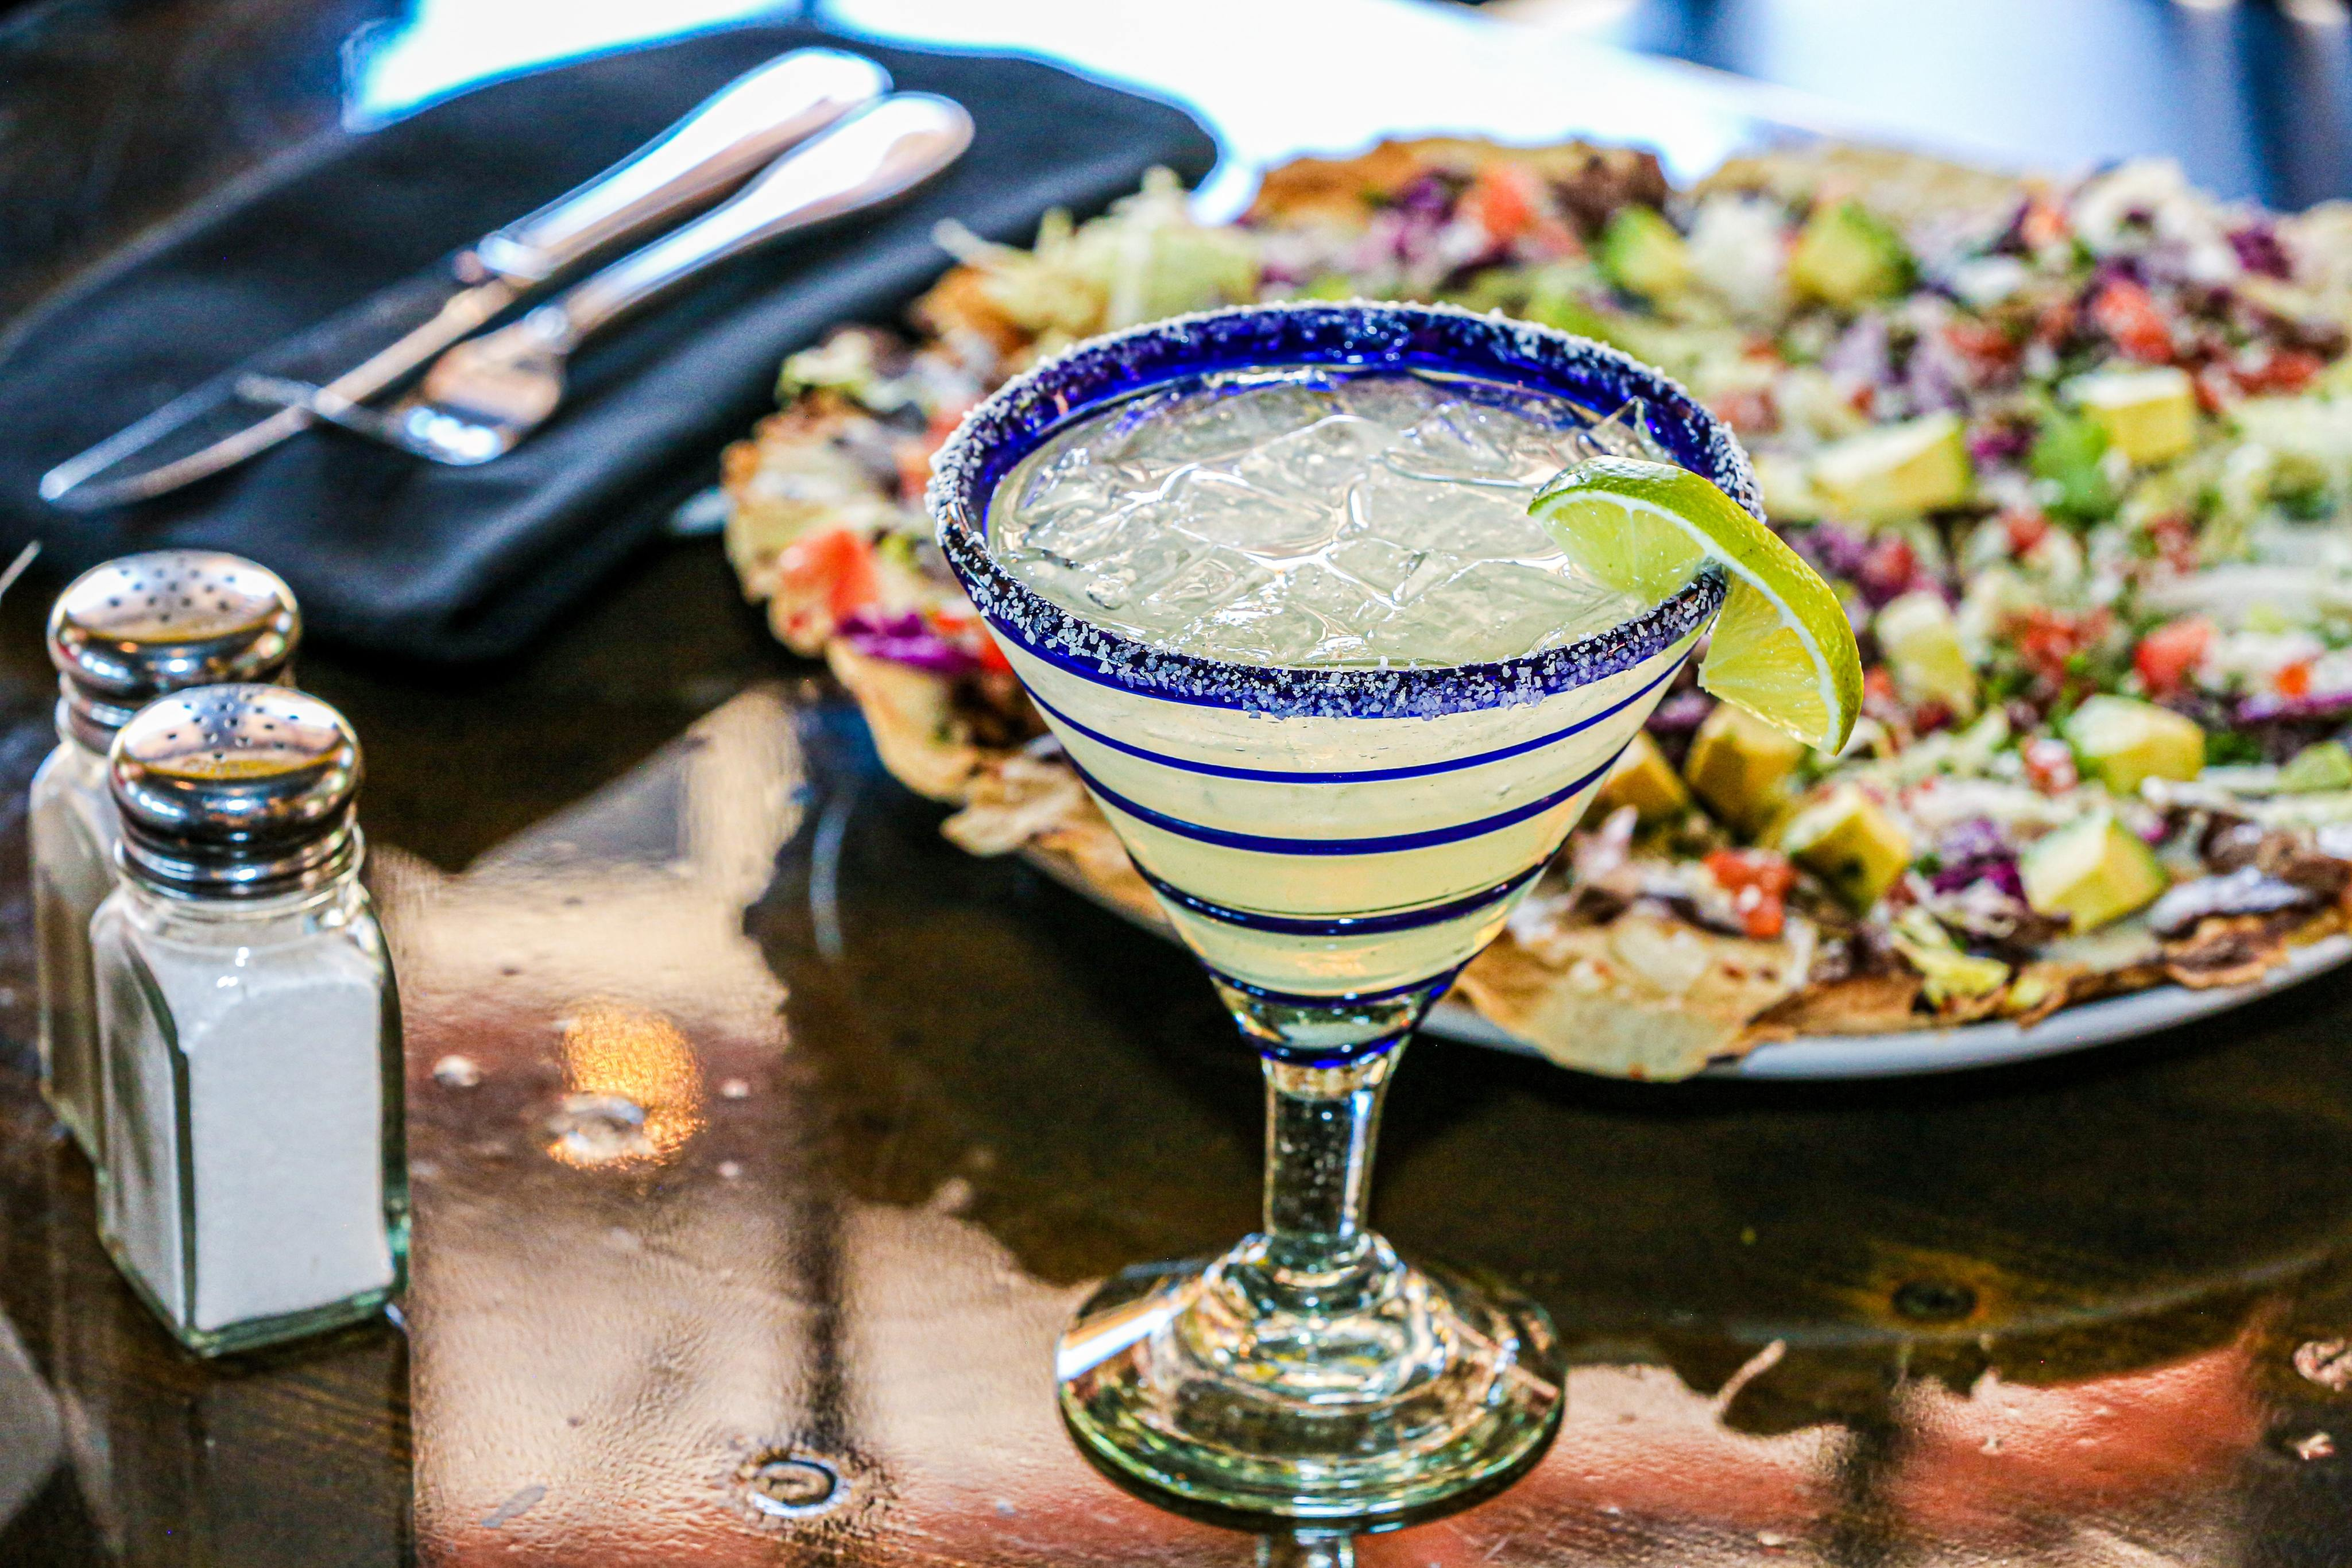 Best Mexican Restaurants To Visit This Cinco De Mayo | Gilbert, AZ-image